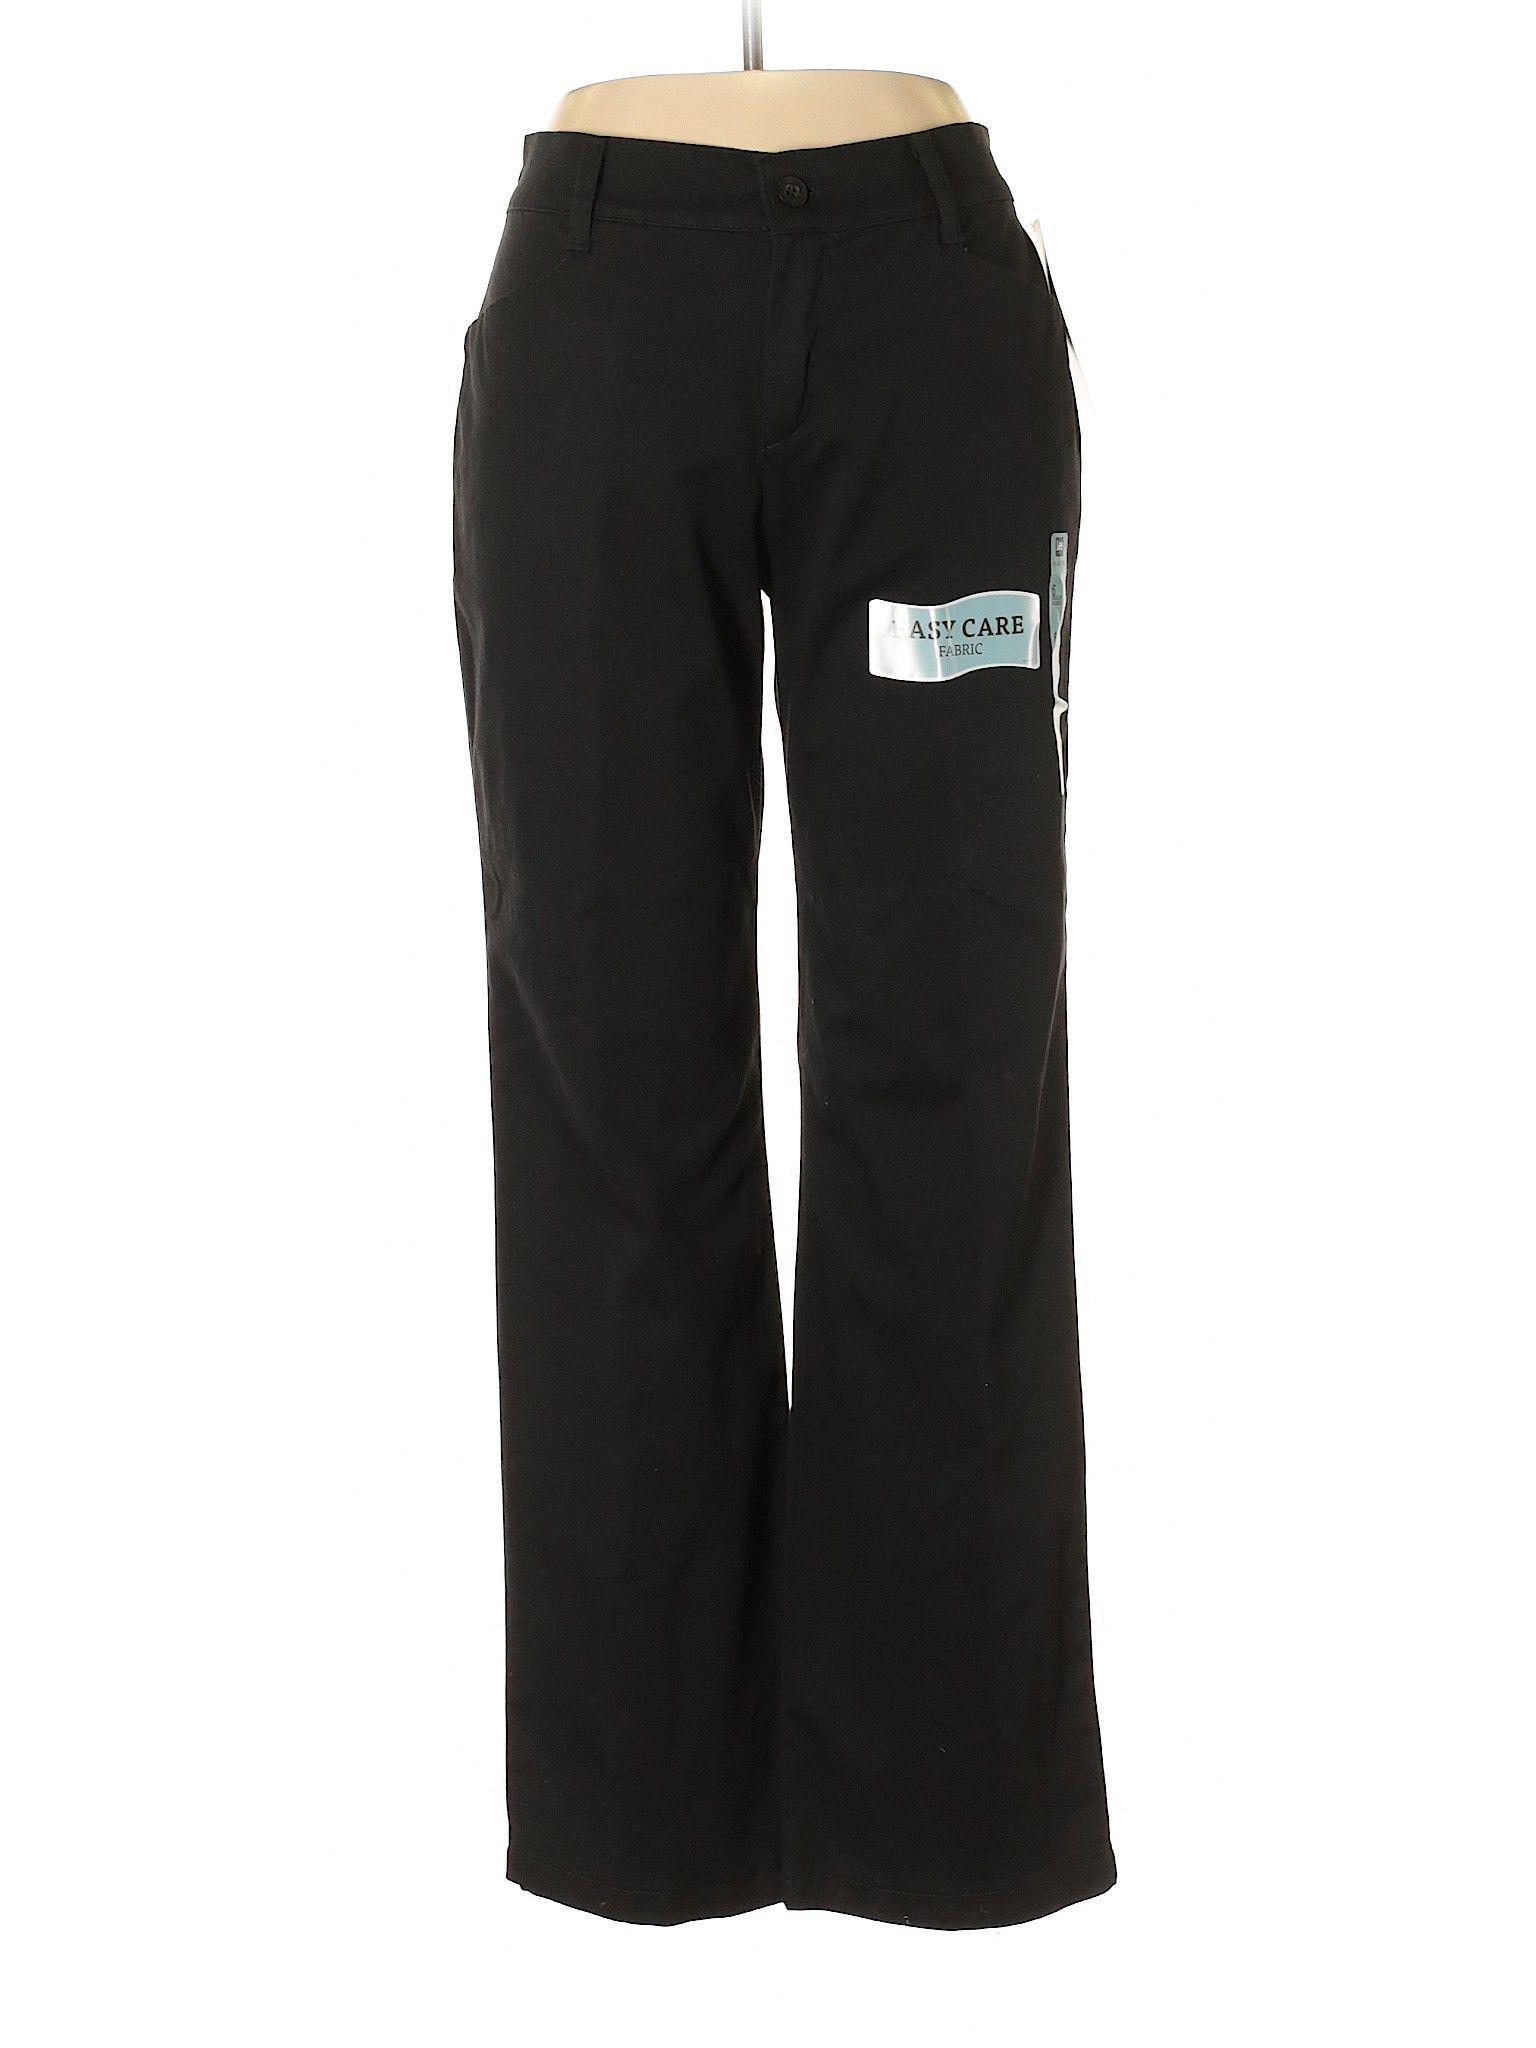 6de33c73709 Lee Jeans: Size 6.00 Black Women's Bottoms - New With Tags - $14.99